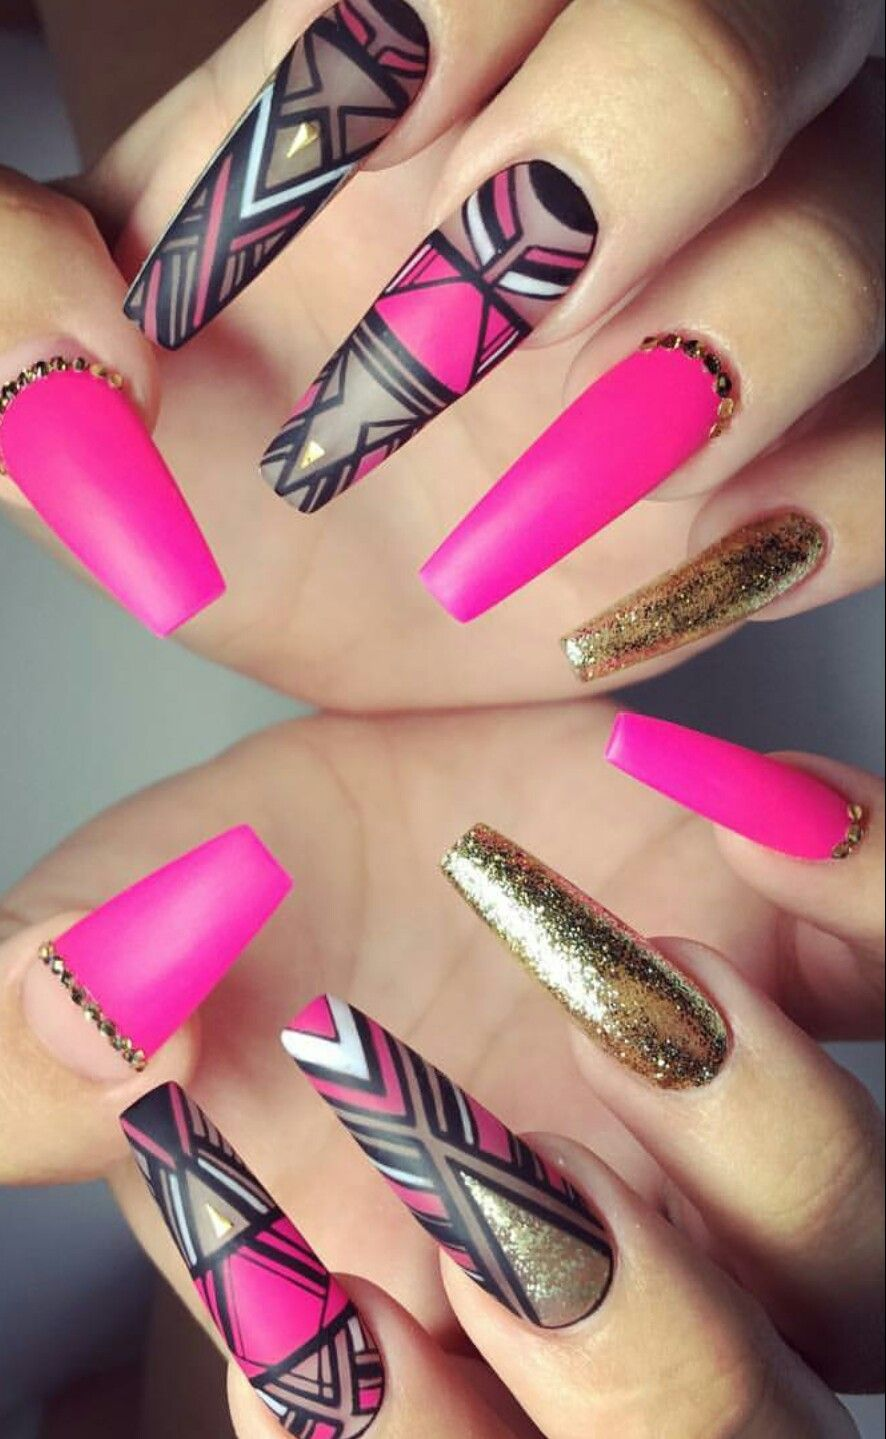 Pink gold aztec fuschia nails @helennails_yeg | Nails | Pinterest ...